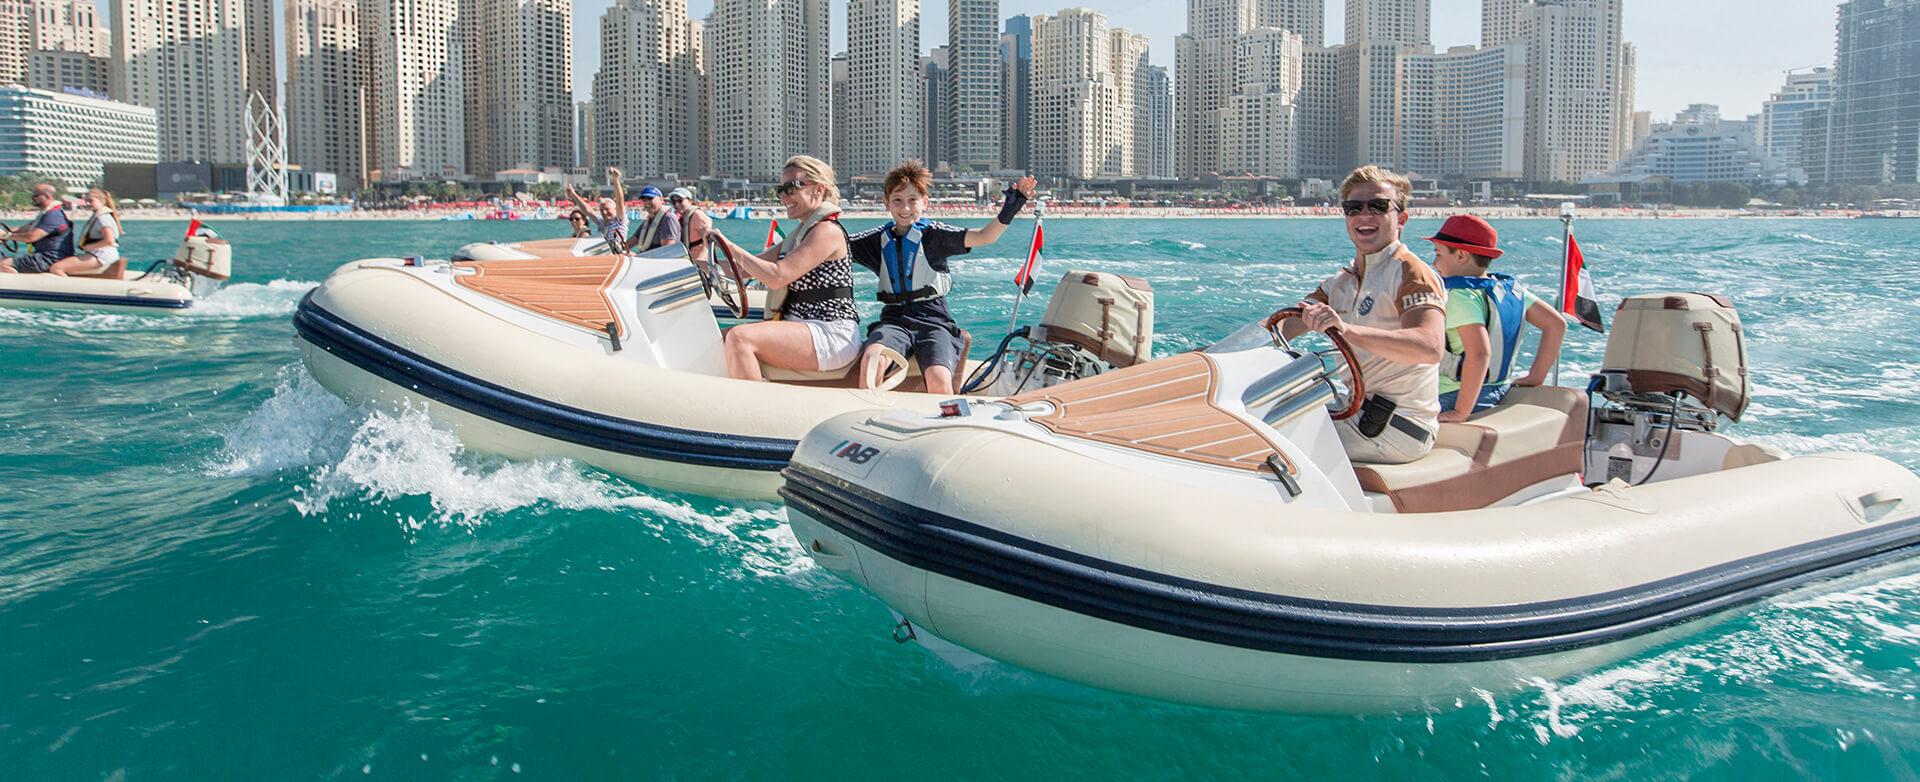 HERO Boat Tour Dubai